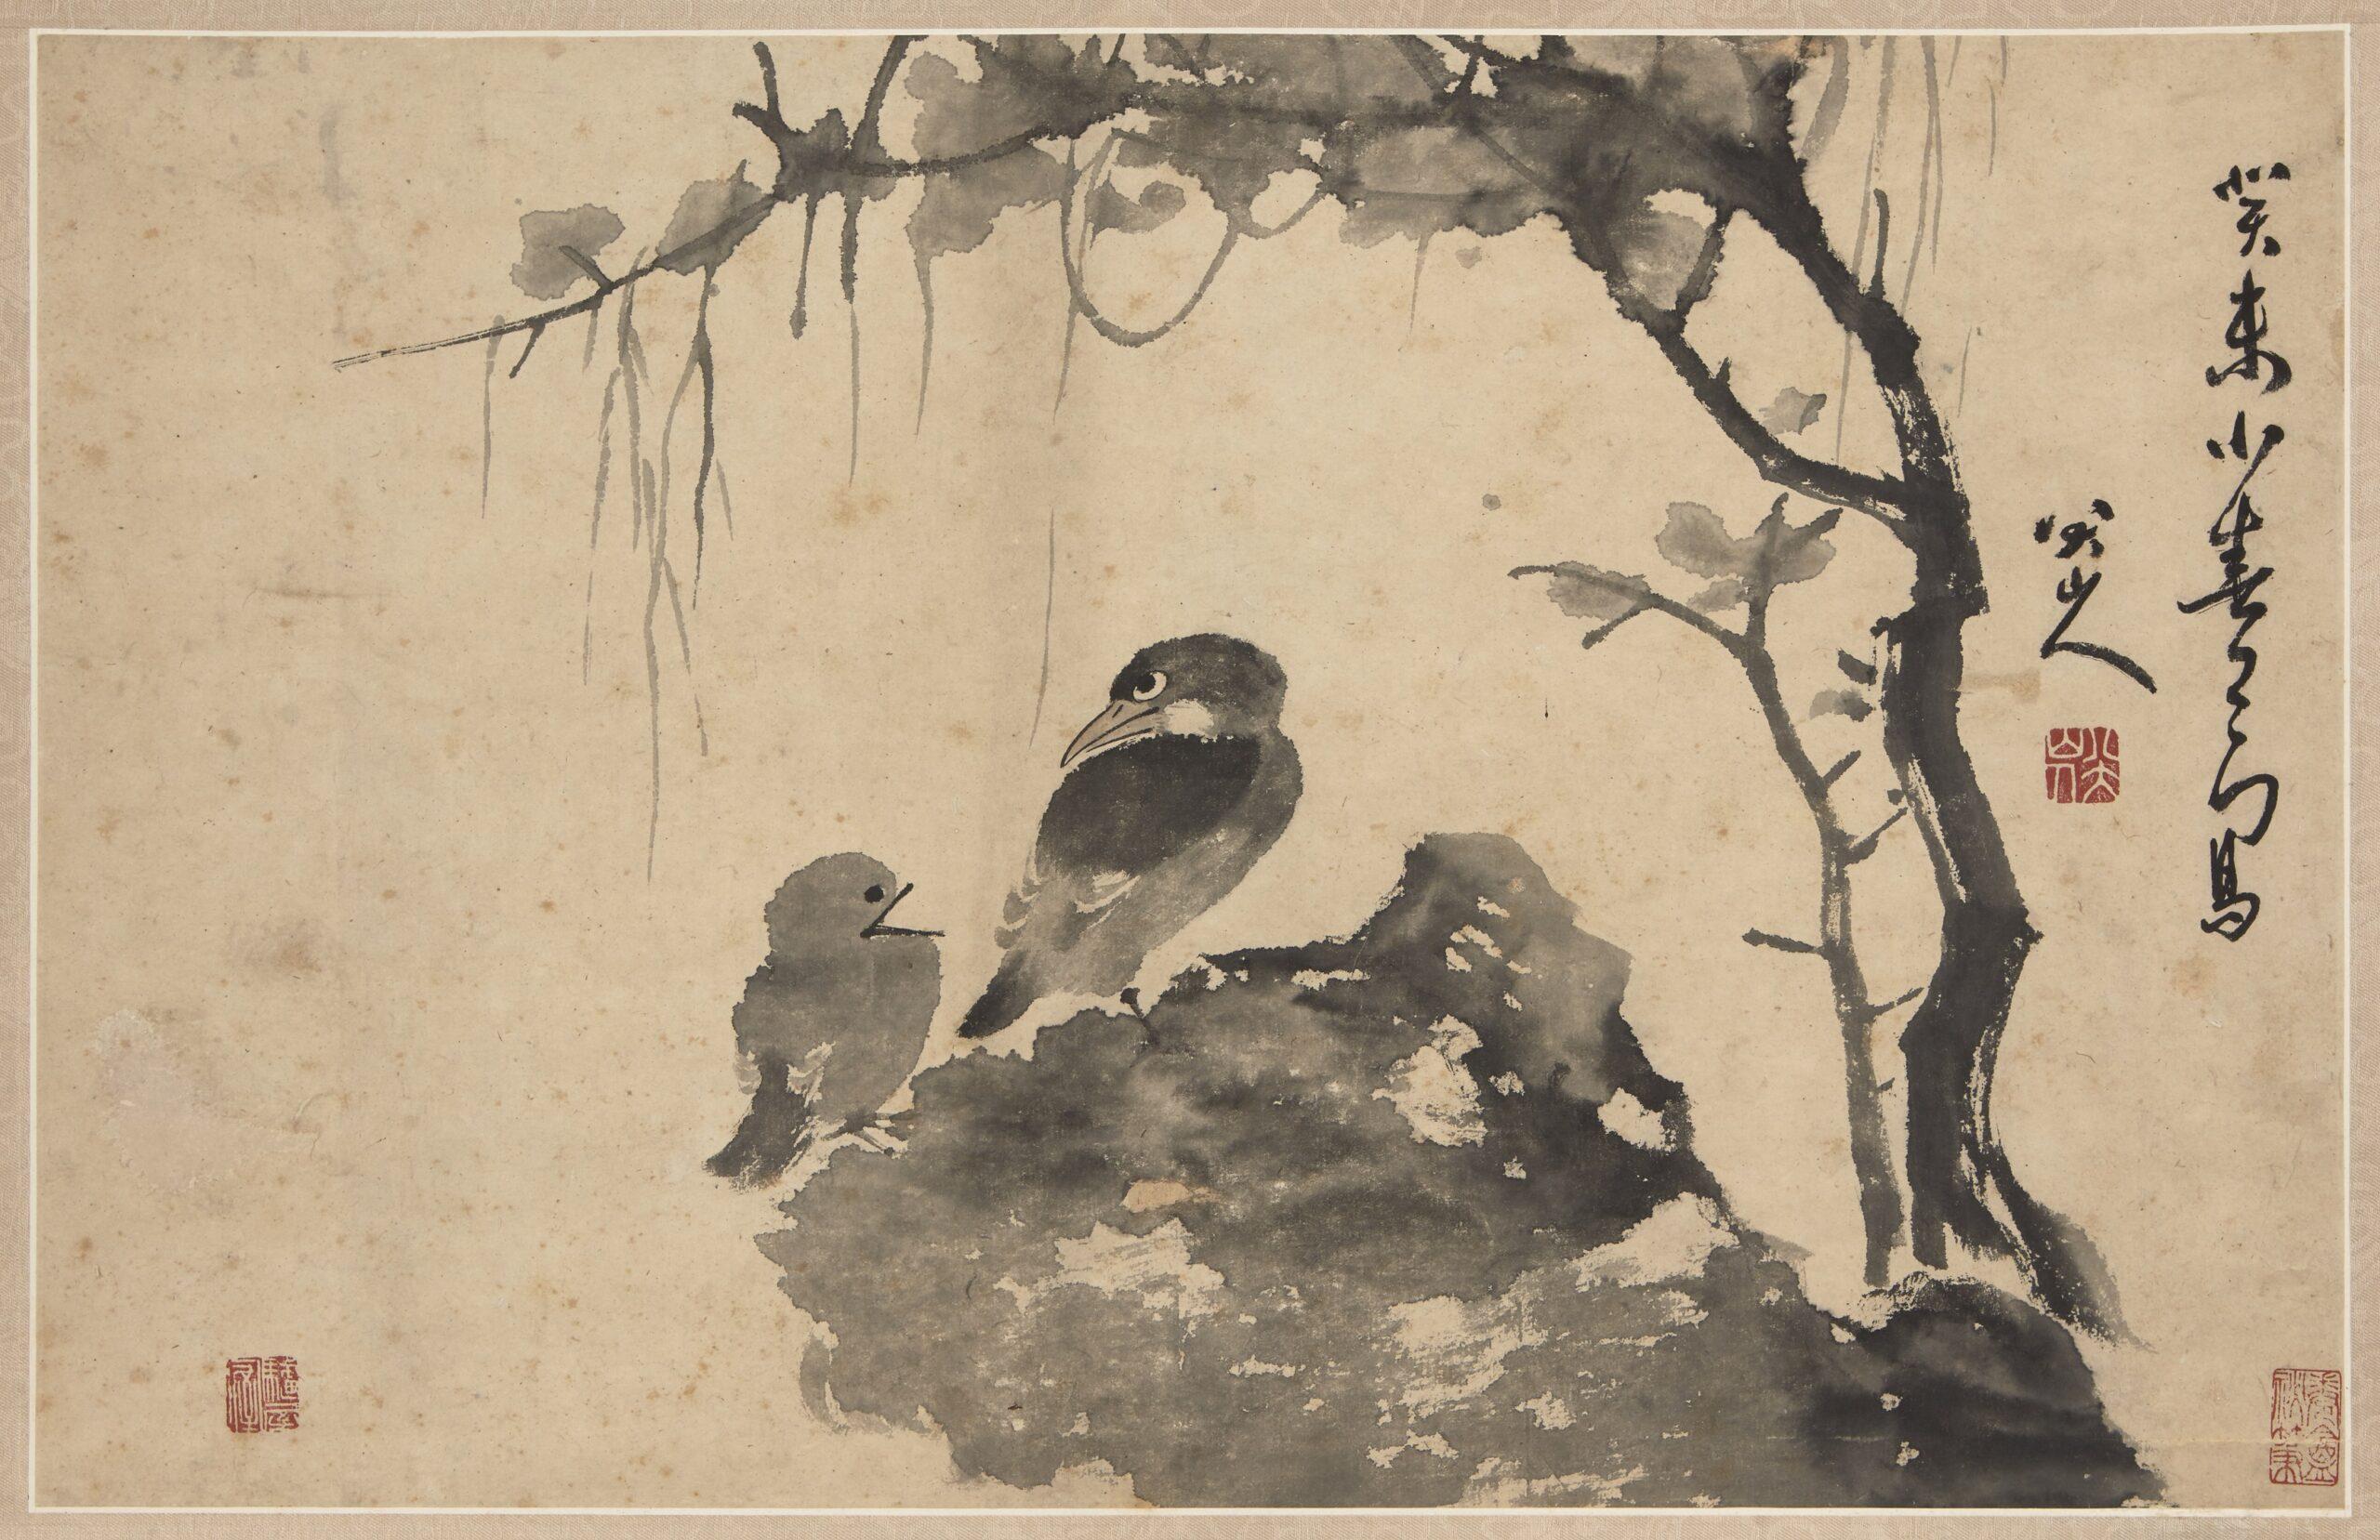 ZHU DA (BADA SHANREN) (c. 1626 – 1705), ink on paper, hanging scroll, two birds on a branch, 35.2 x 55.3cm, £50,000-£80,000